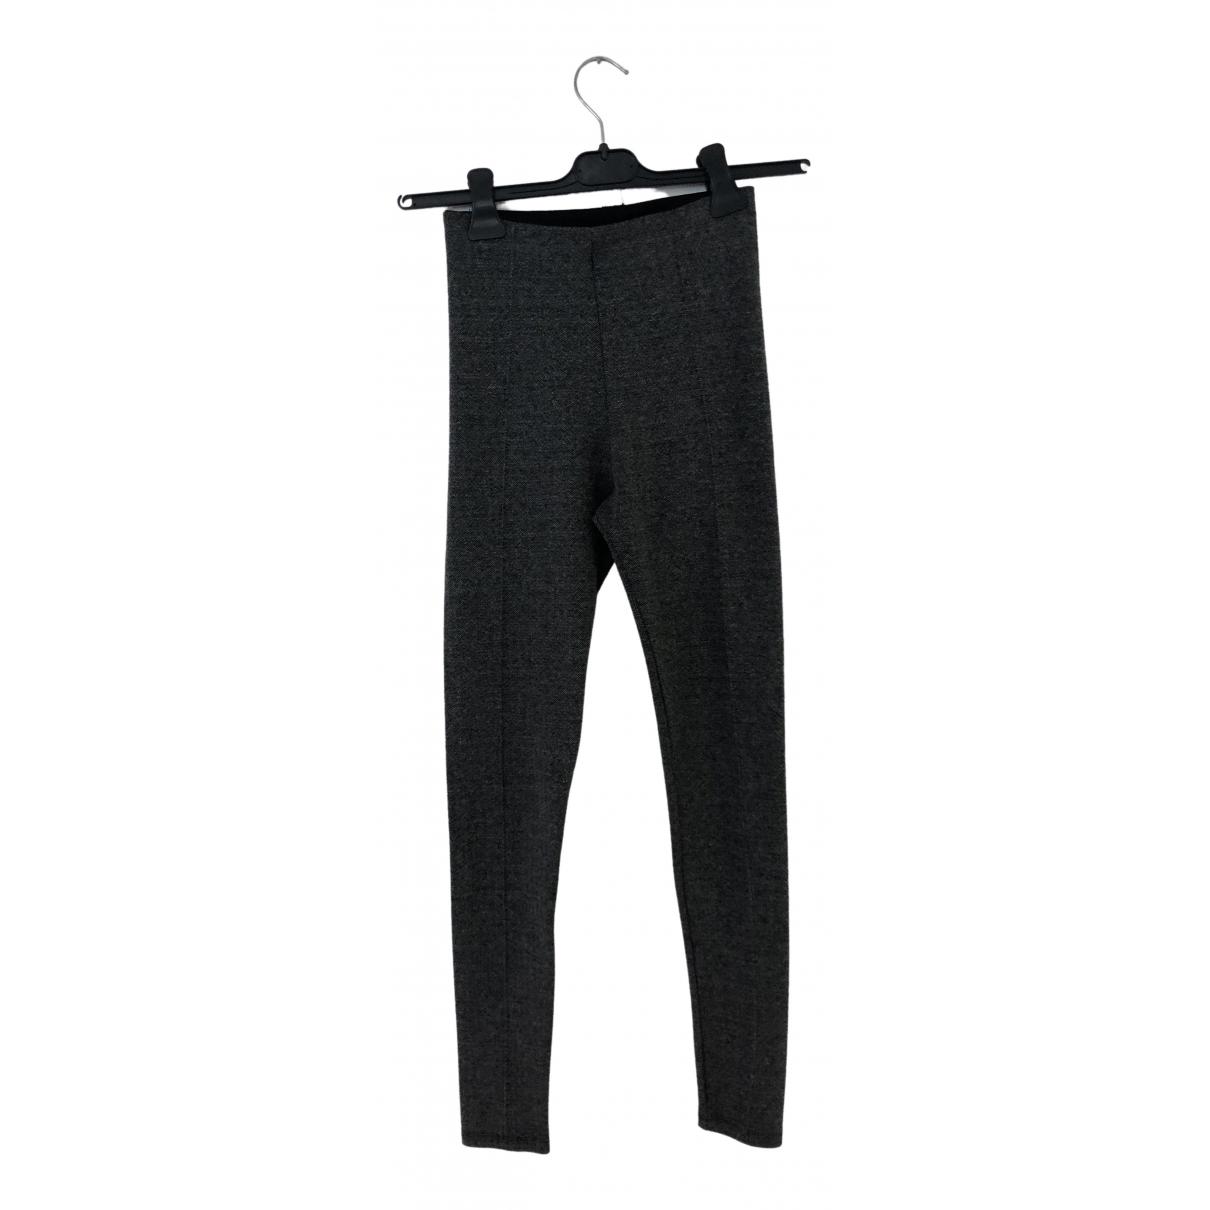 Zara \N Grey Spandex Trousers for Women 36 FR